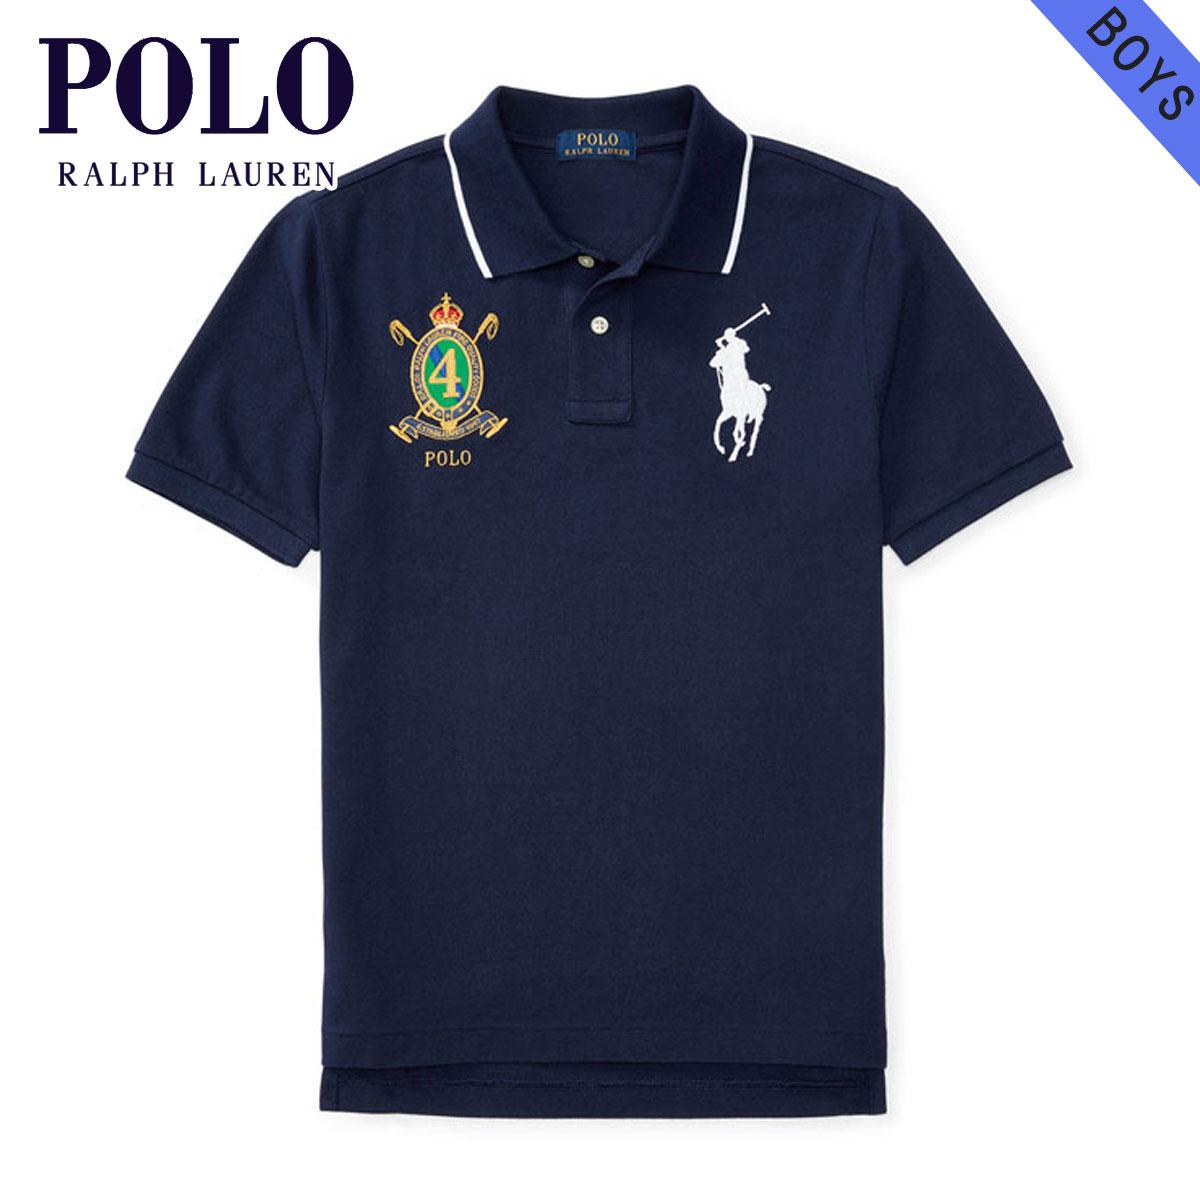 e4c7934affa4a Polo Ralph Lauren kids POLO RALPH LAUREN CHILDREN regular article children s  clothes Boys polo shirt COTTON MESH POLO SHIRT 112934956